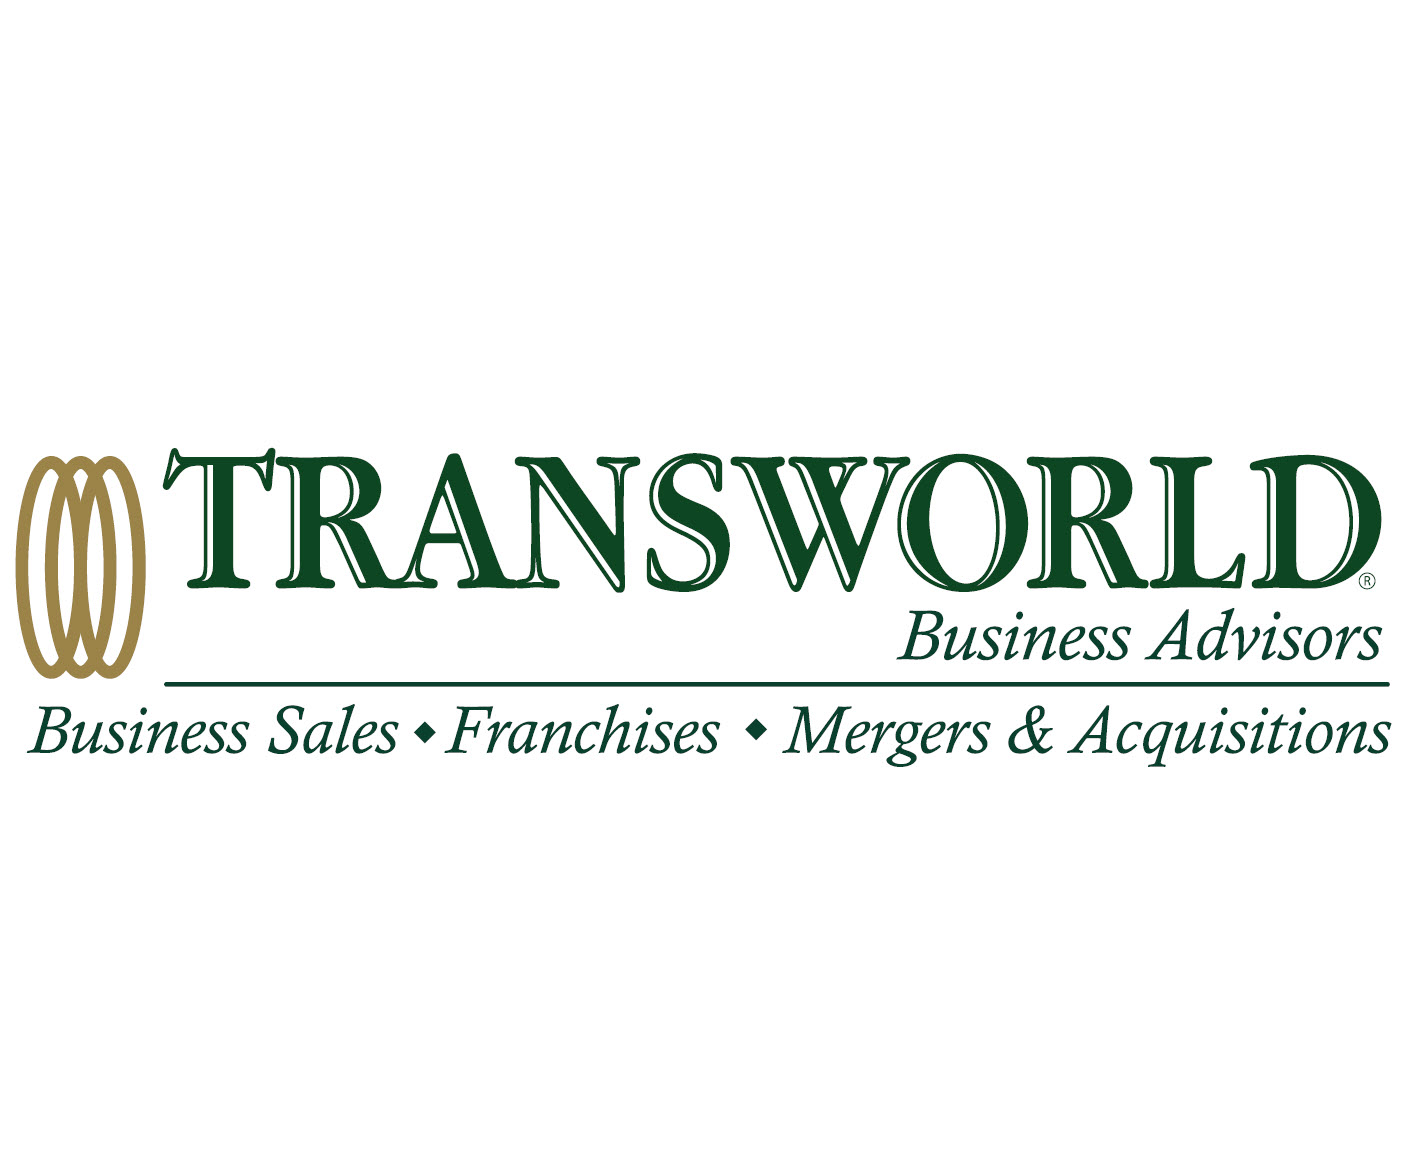 Transworld Business Advisors South Yarra Logo